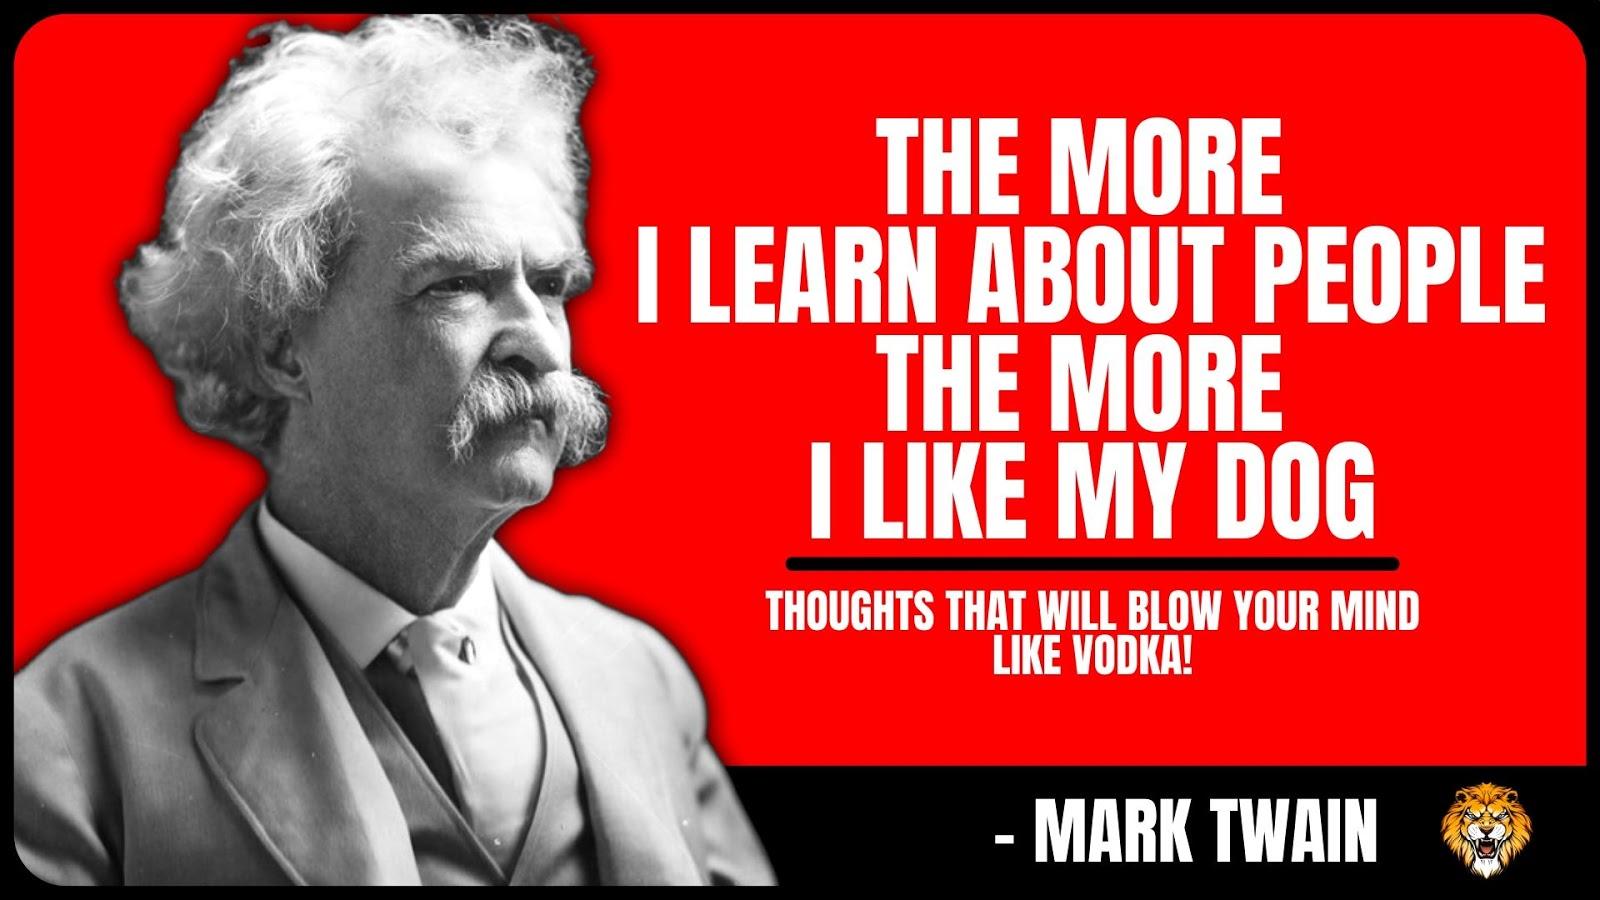 Mark Twain Quote Wallpaper for Desktop: Inspirational Quote Wallpaper